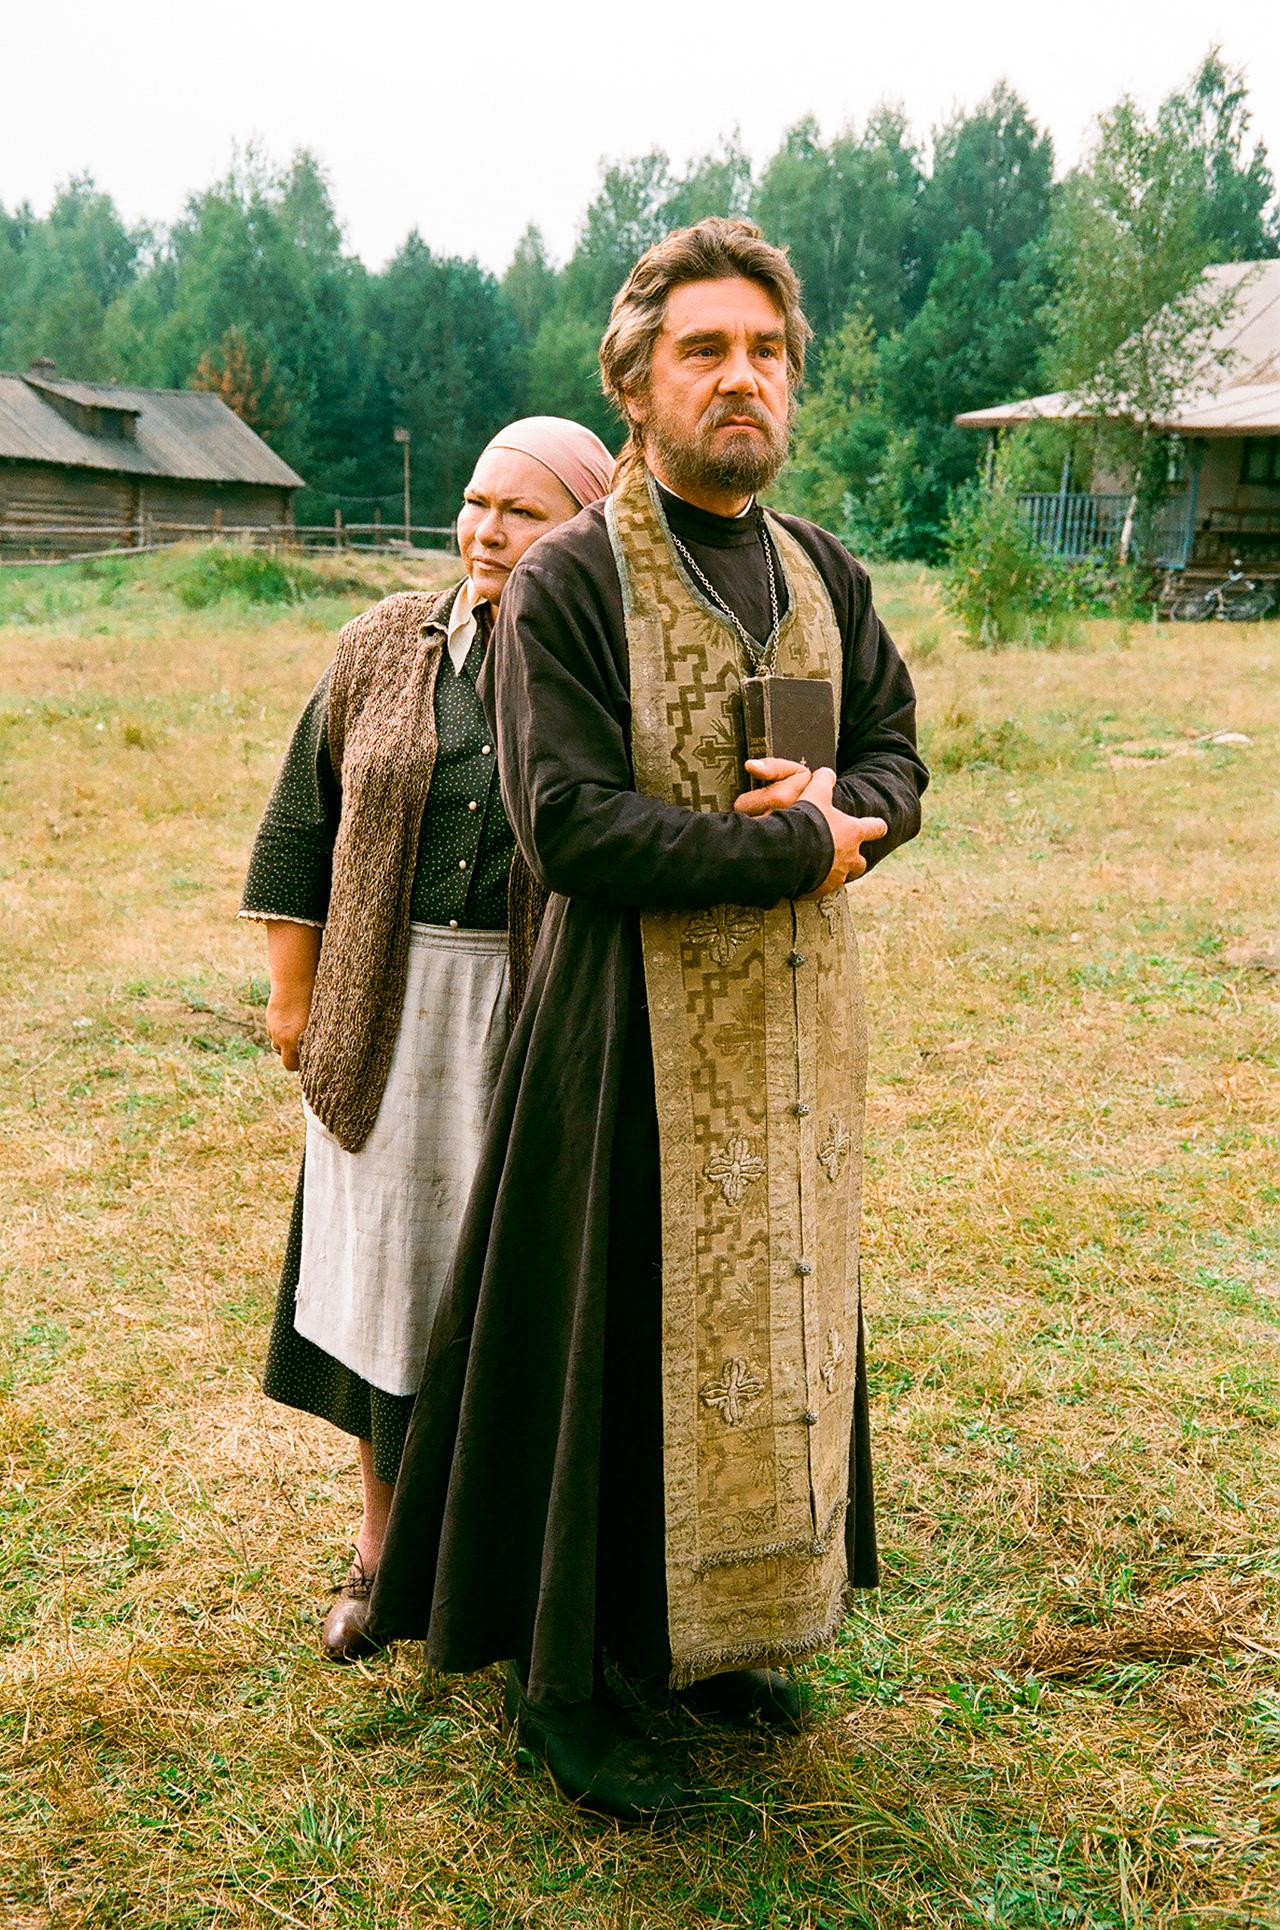 "Nina Usatova as Mother Alevtina and Actor Sergei Makovetsky as Father Alexander appear in a scene from ""Priest"" movie directed by Vladimir Khotinenko, Pskov Region, 2010. / Photo: TASS"